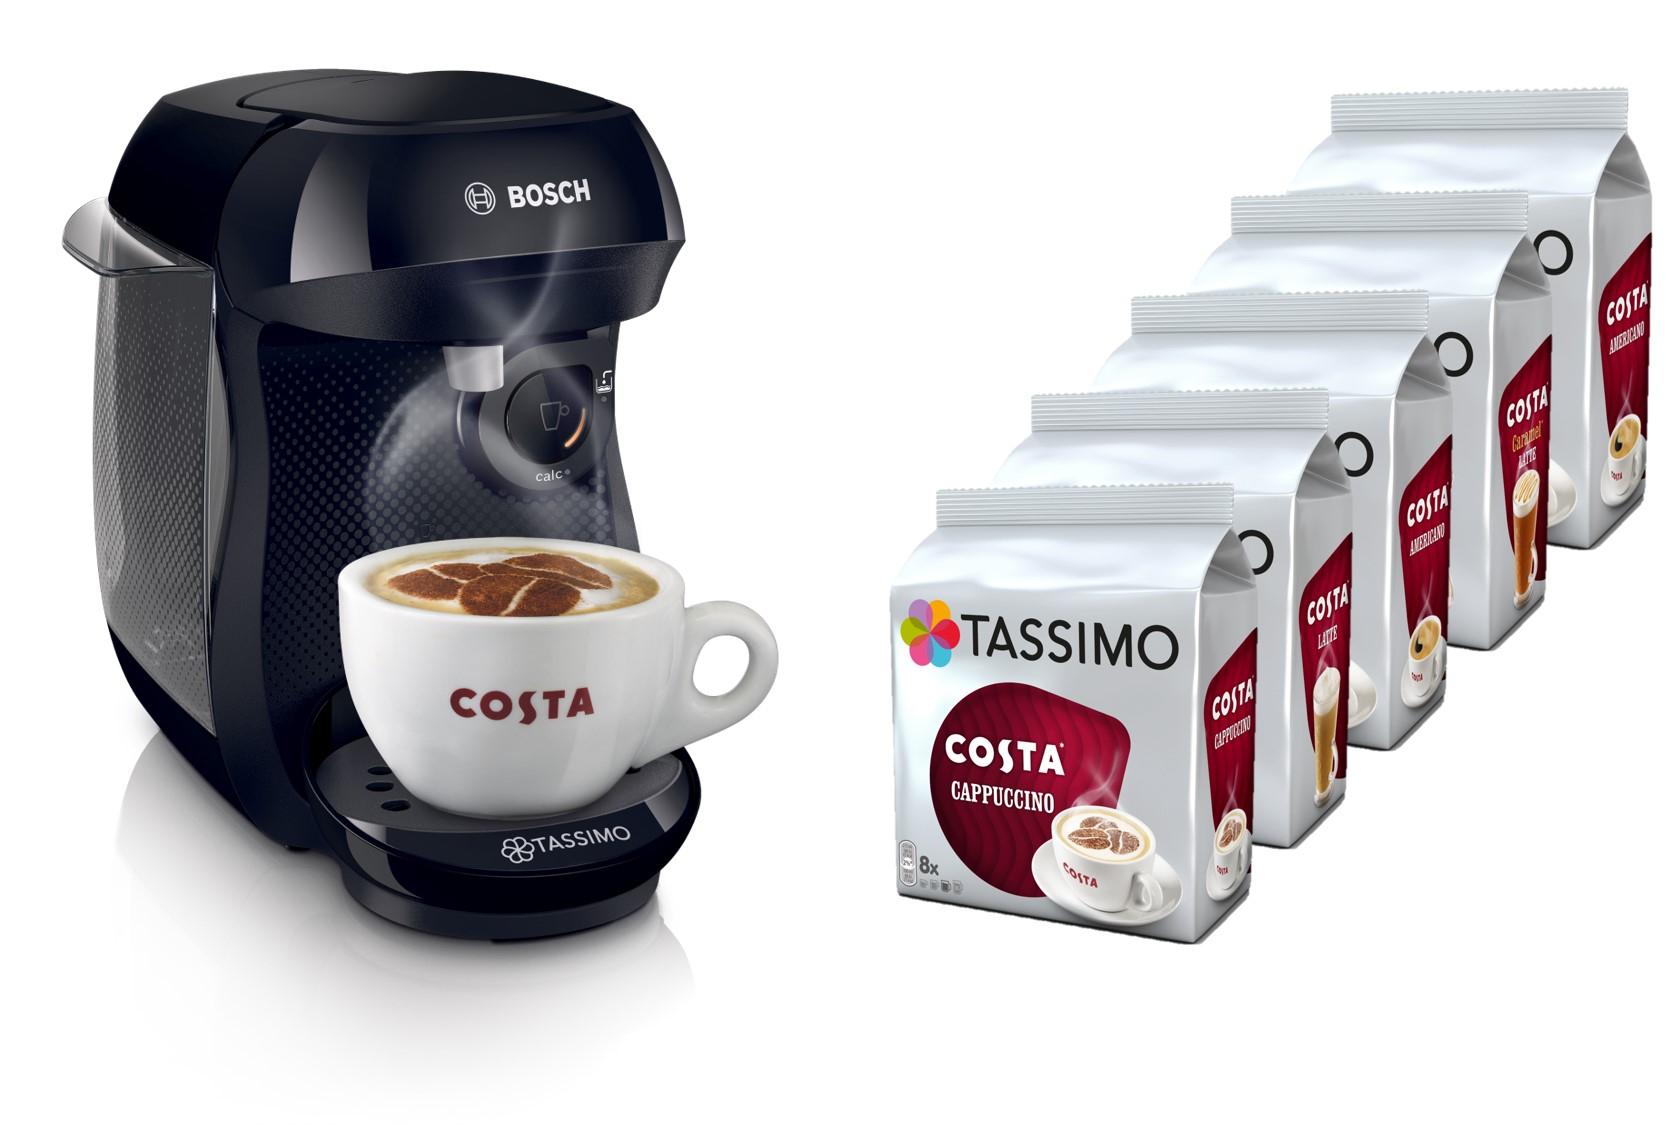 Tassimo happy machine + 5 packs tassimo costa £49.99 @ Tassimo